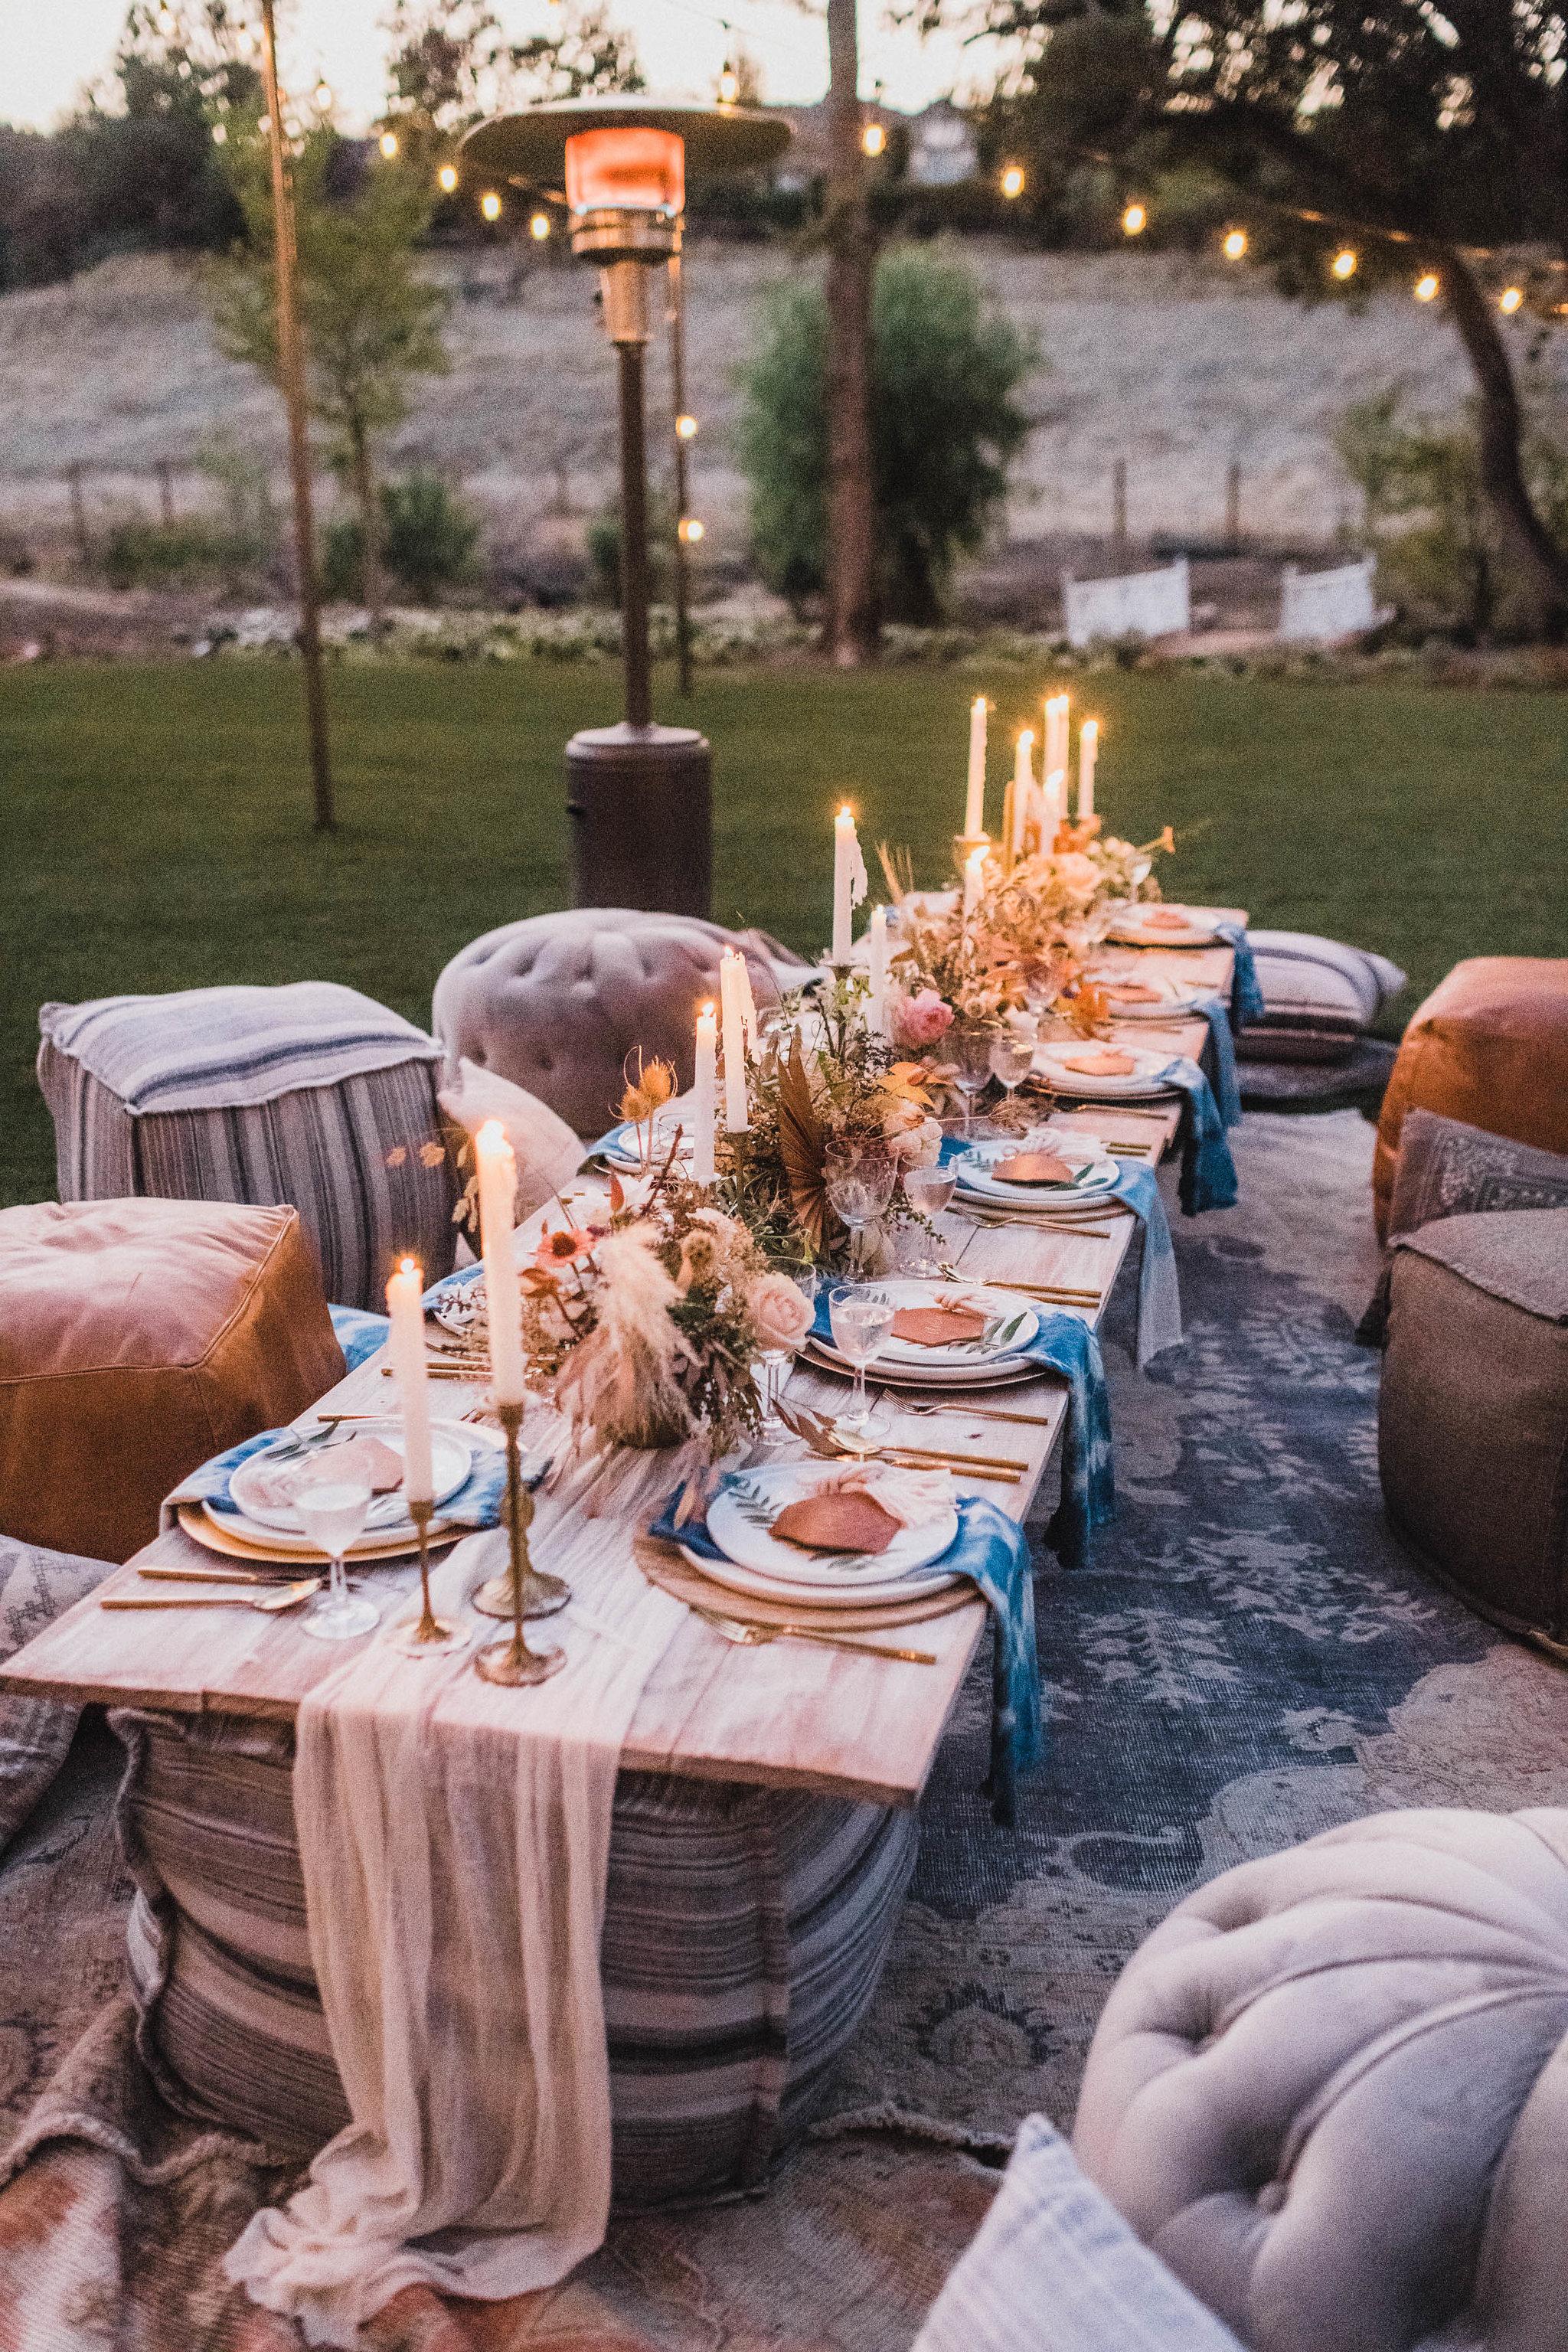 custock-photography-intimate-birthday-dinner-288